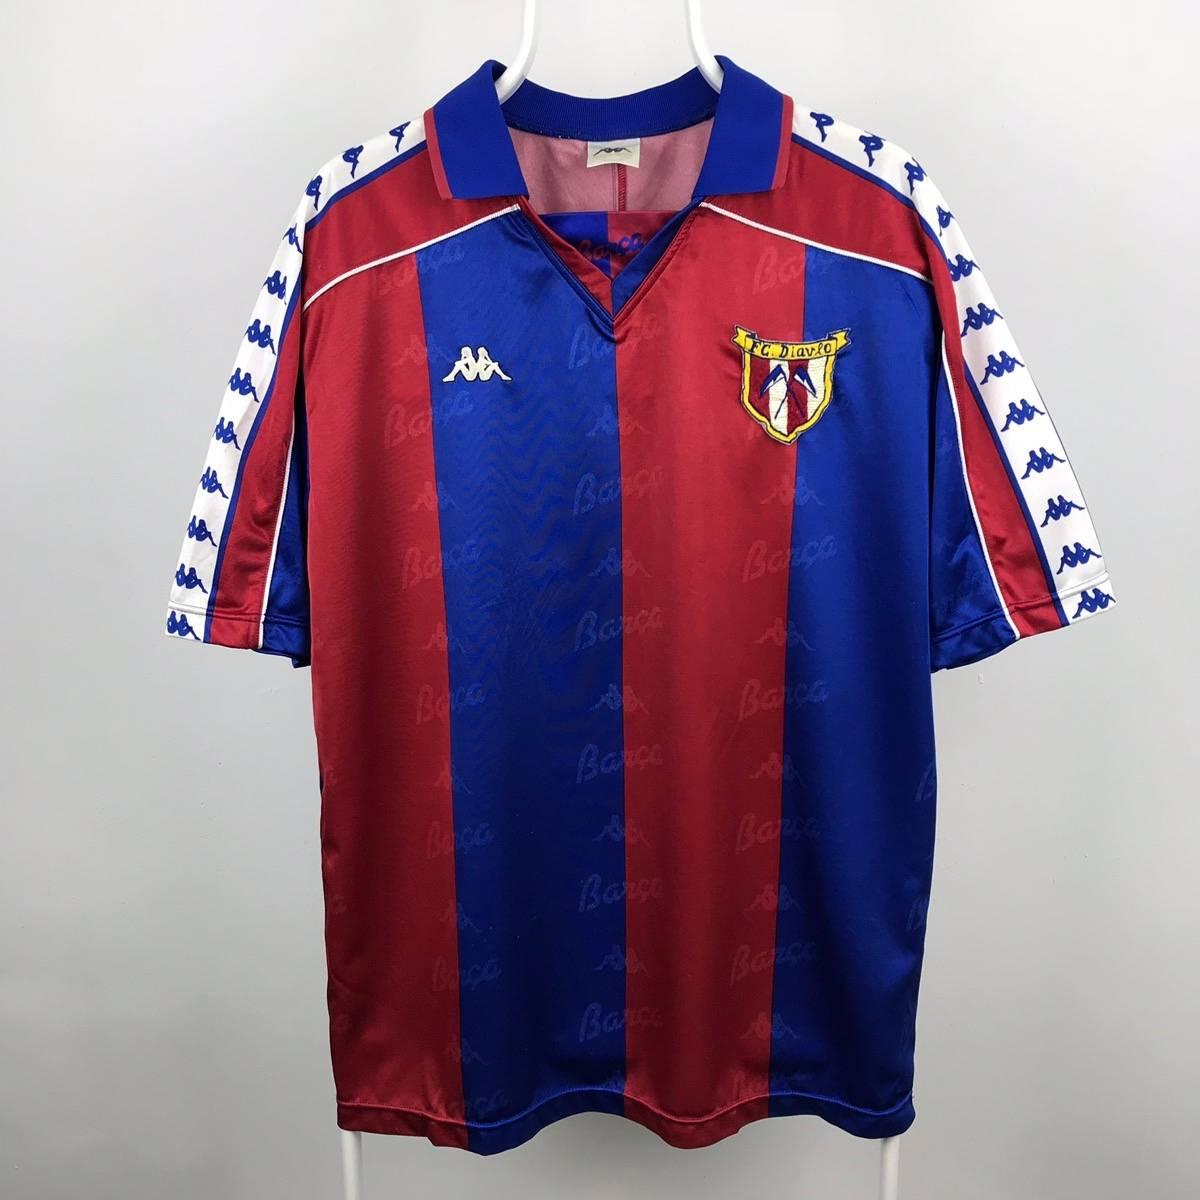 size 40 e8c94 24873 Kappa × Vintage 🍎Free Shipping🍎Vintage Kappa Barcelona Jersey As227 Size  L $72